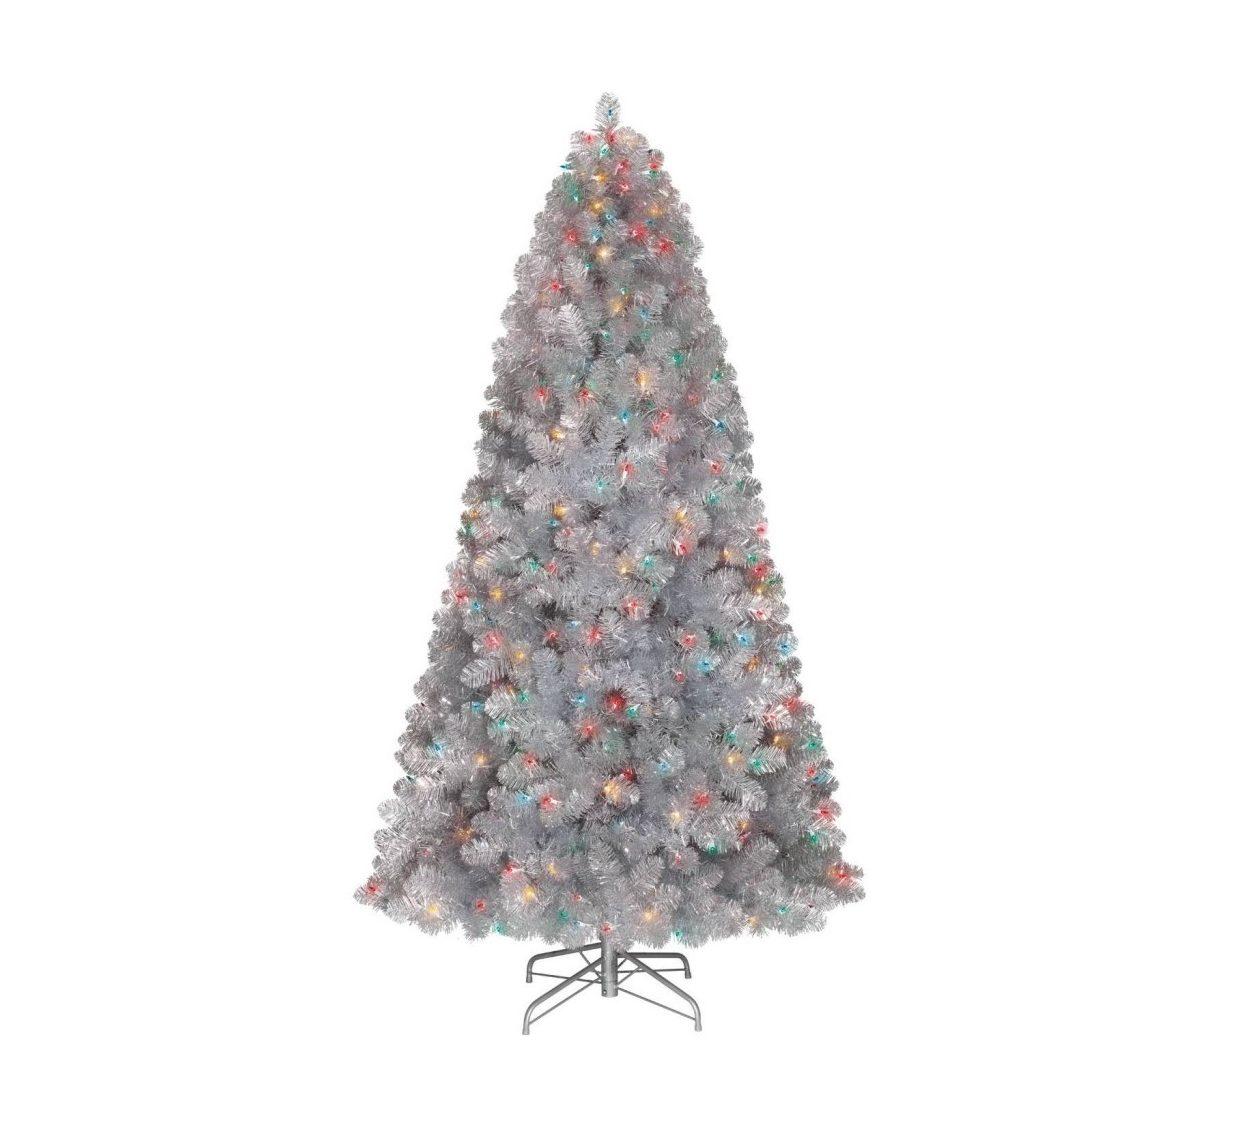 7 retro christmas trees and wreaths to celebrate the season - Retro Christmas Tree